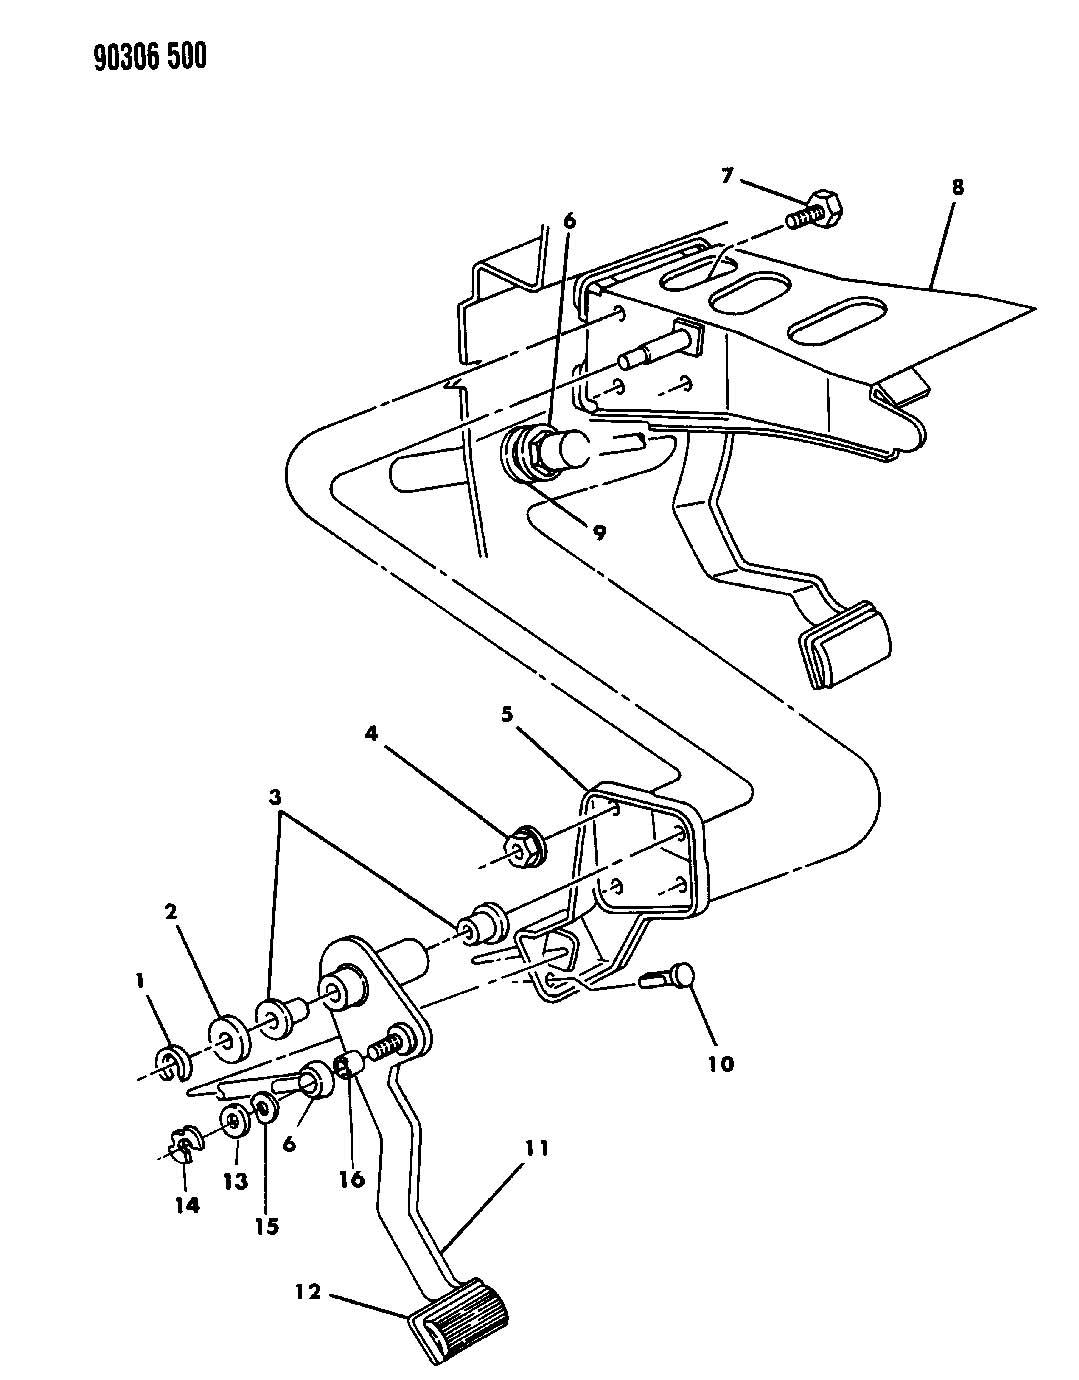 hight resolution of 95 suzuki sidekick vacuum diagram suzuki auto wiring diagram 96 nissan pathfinder stereo wiring colors 96